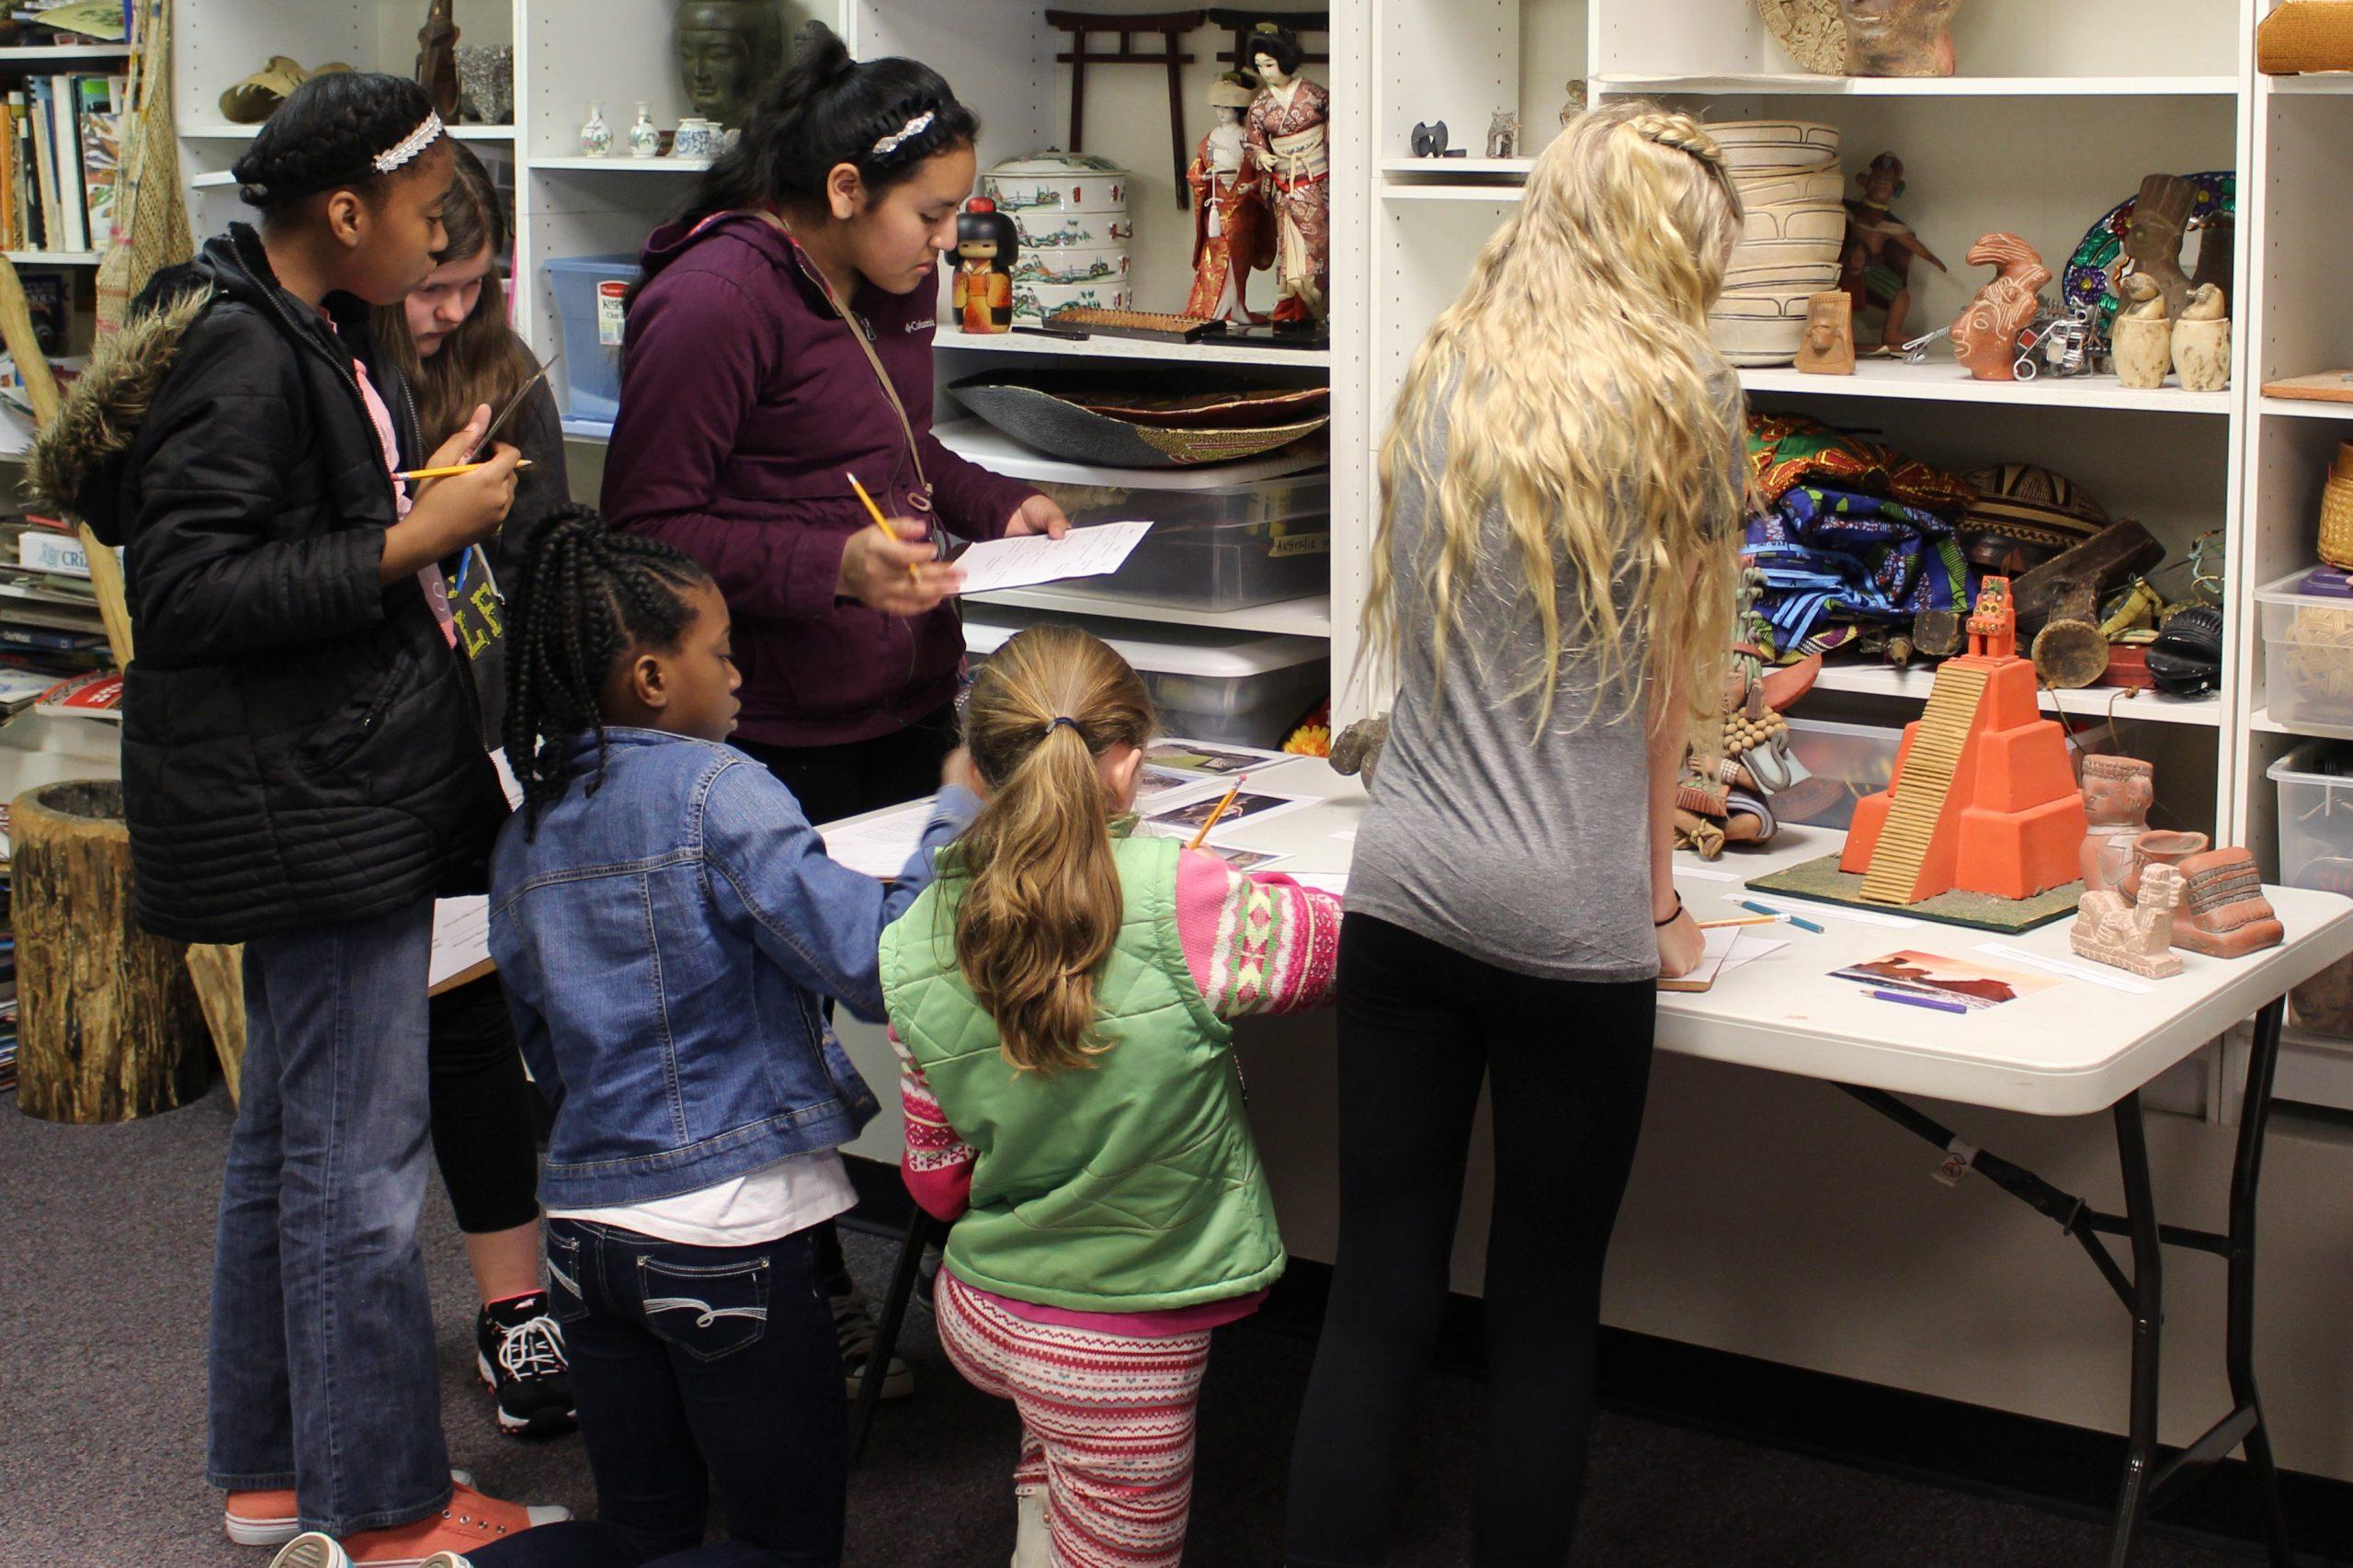 Education class participants examine artifacts